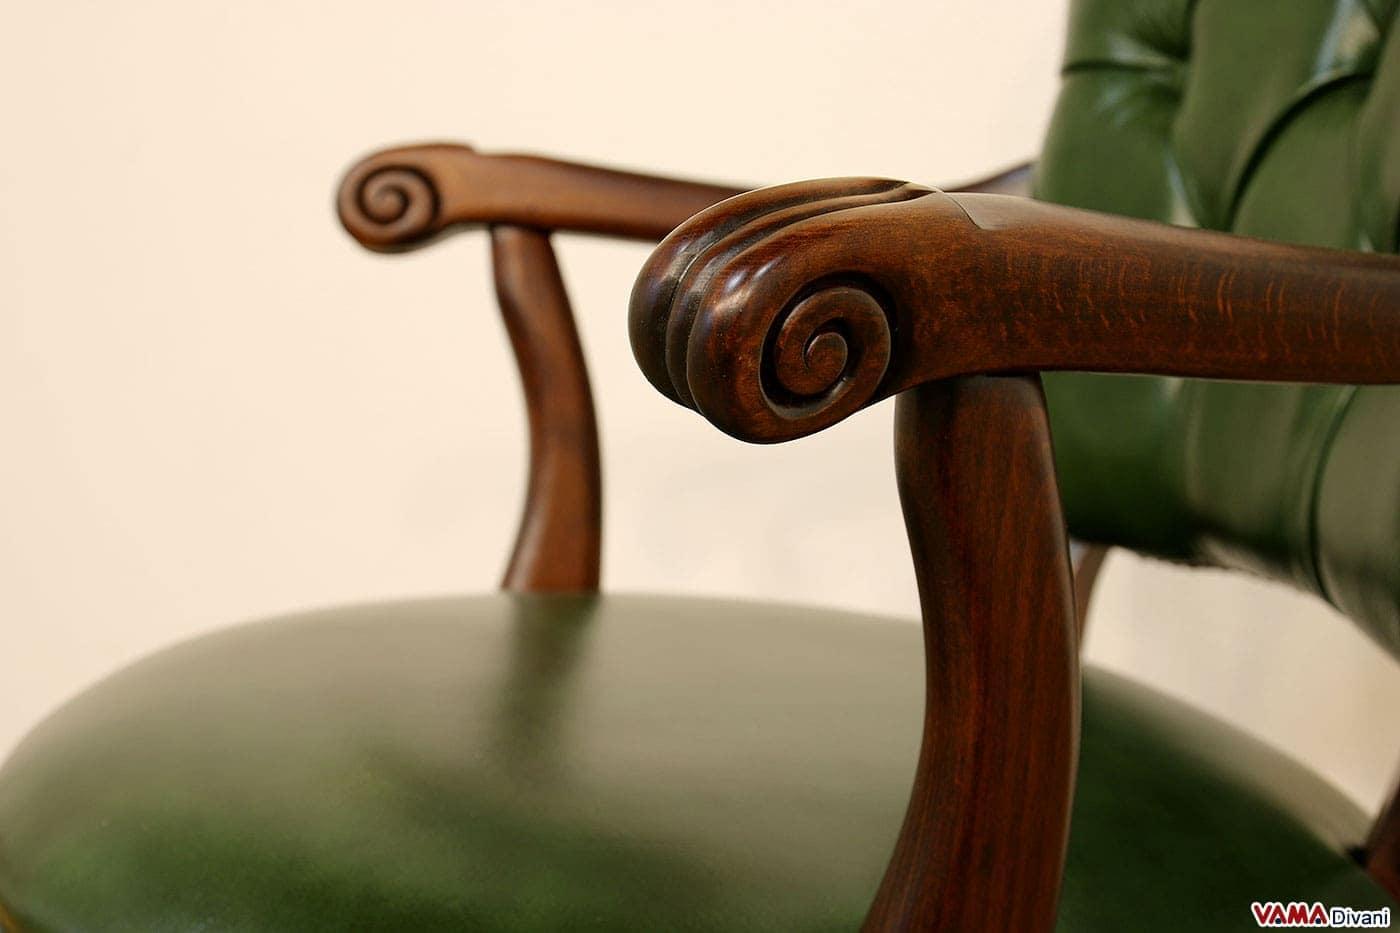 Sedia Scrivania Verde: Sedie usate maddalena cava de tirreni sa ...